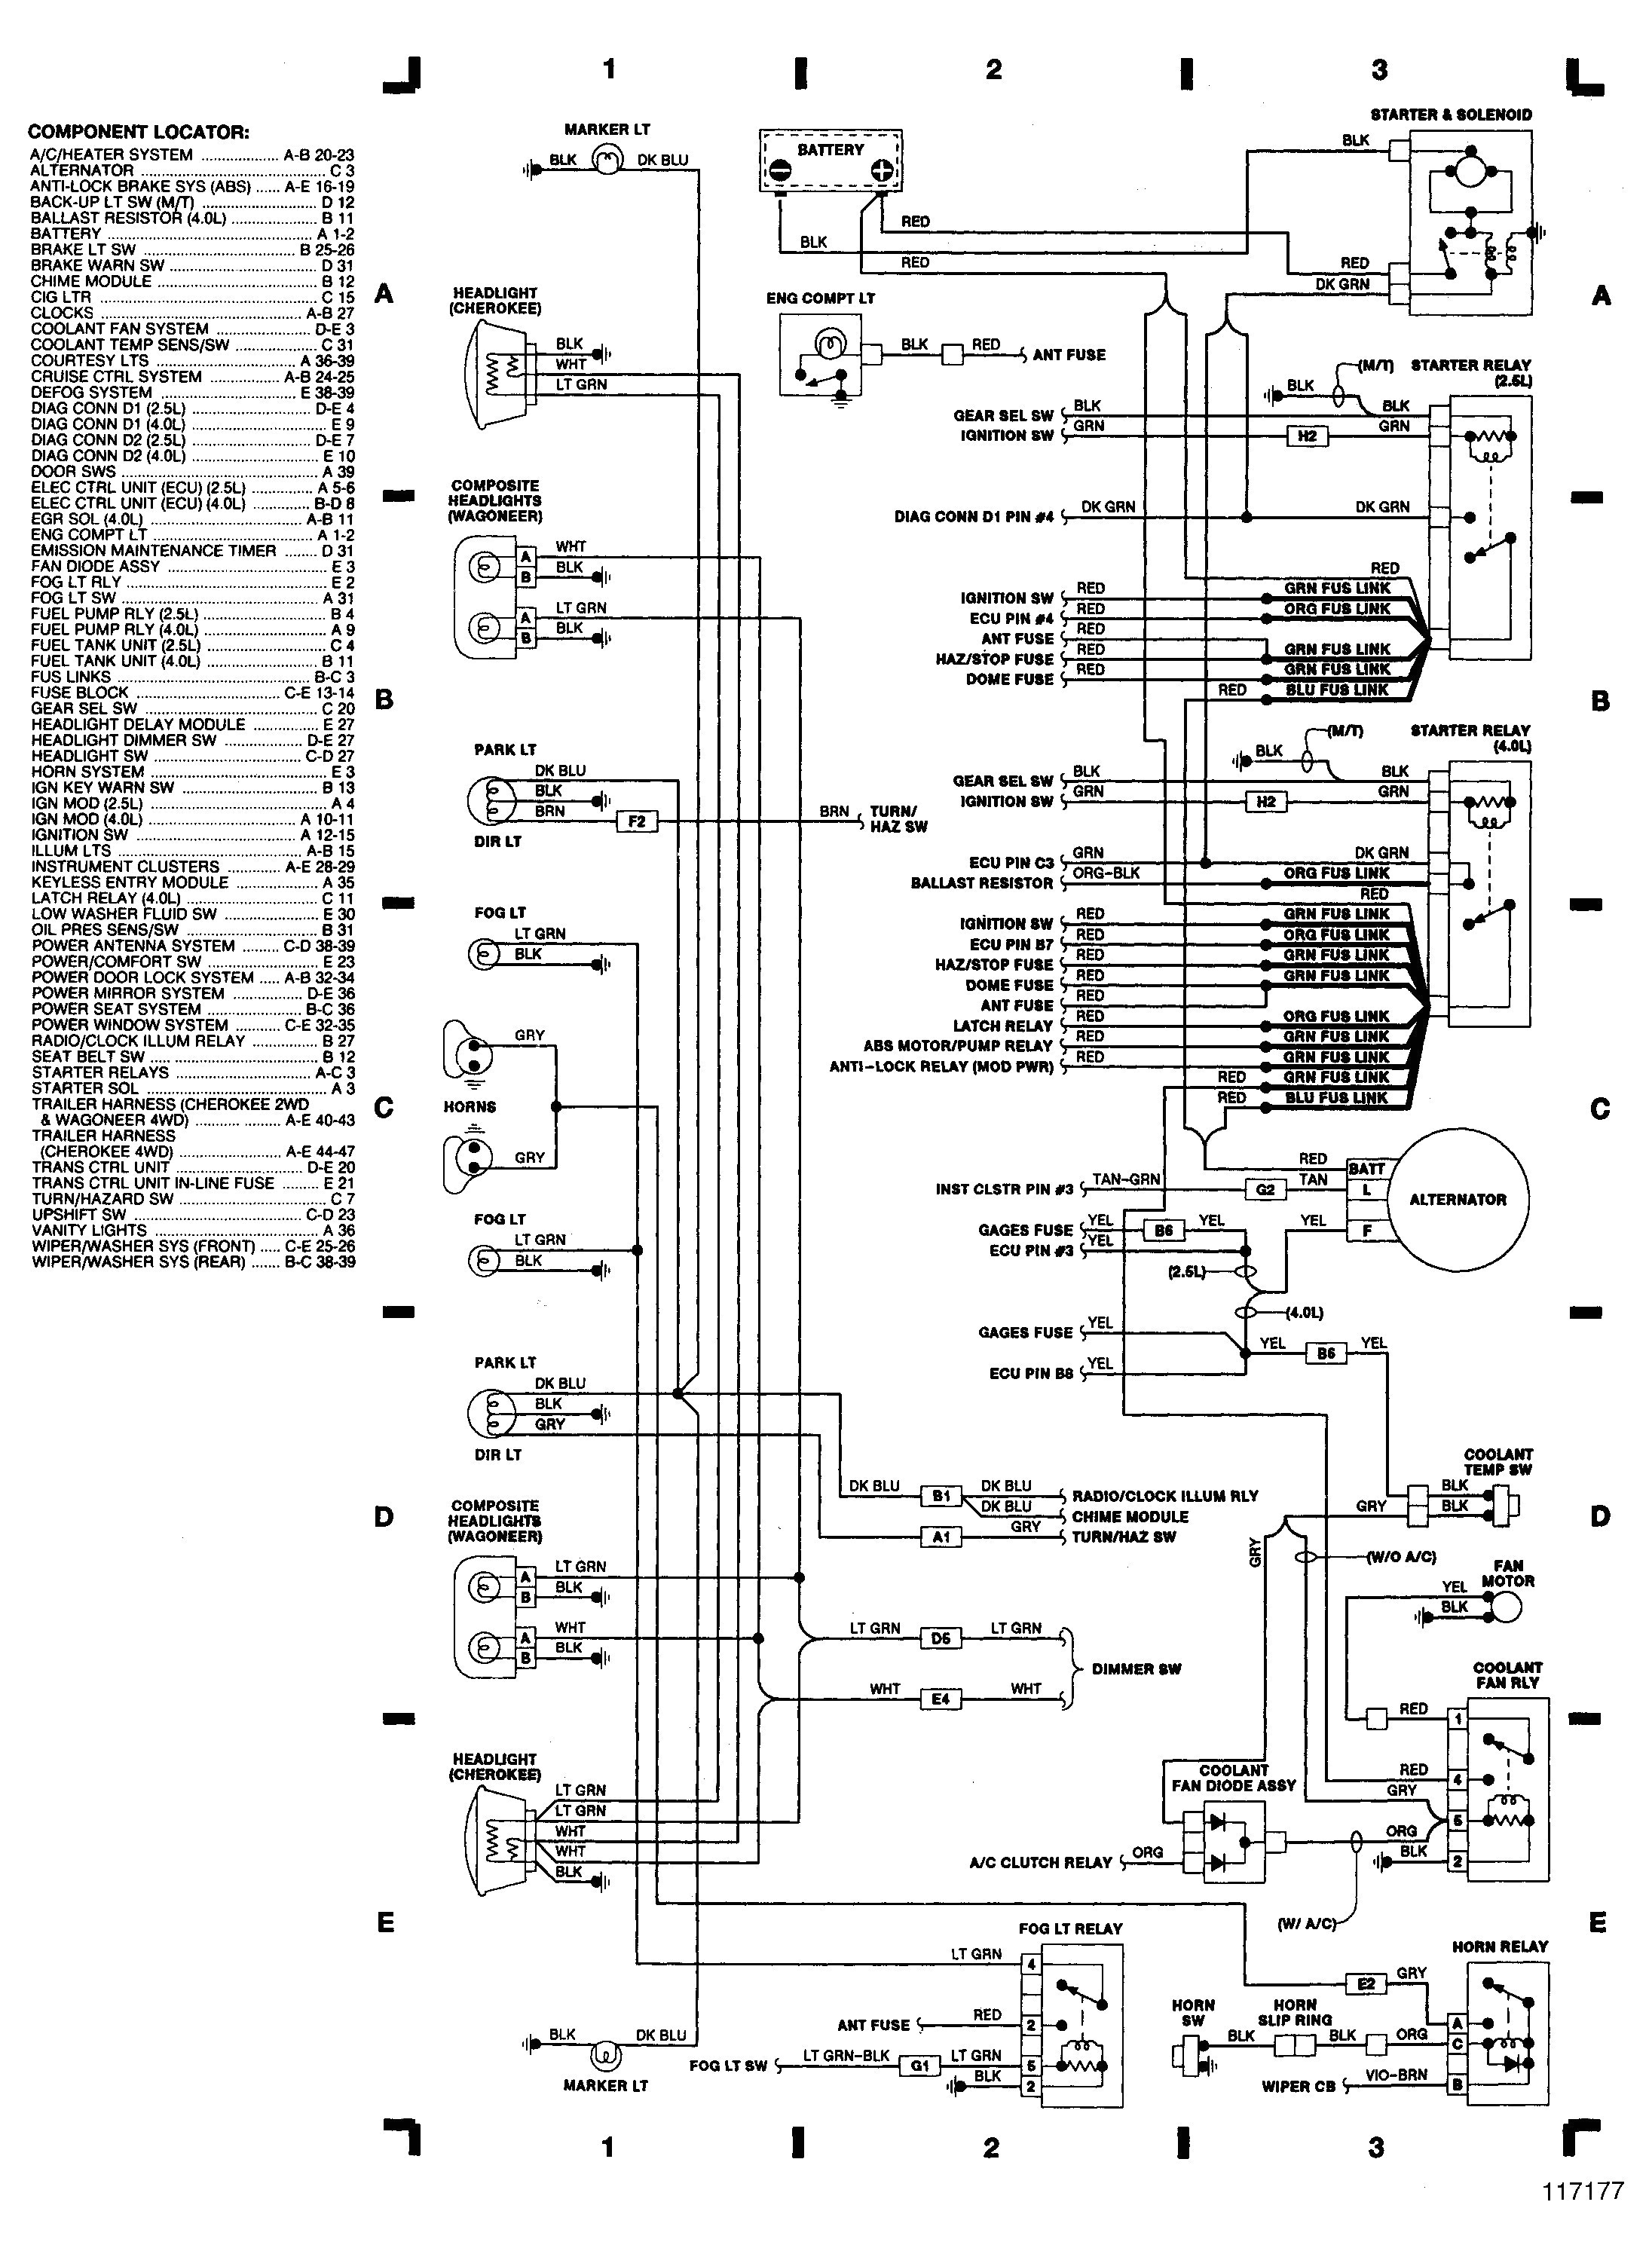 2007 jeep grand cherokee headlight wiring diagram wiring diagram var 2007 jeep grand cherokee headlight wiring diagram